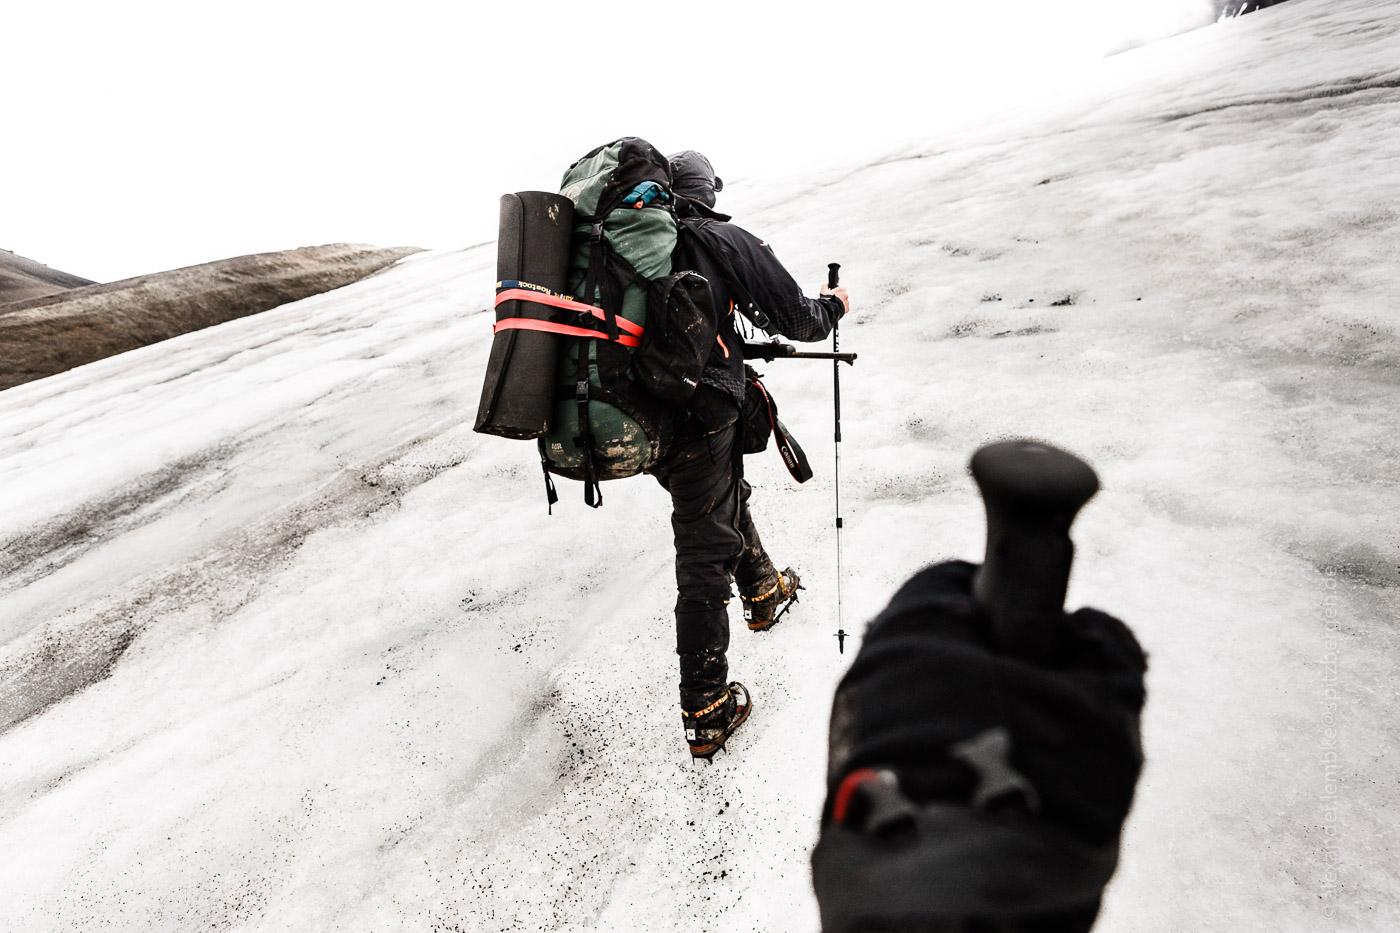 09_land_of_ice_alexanderlembke_de